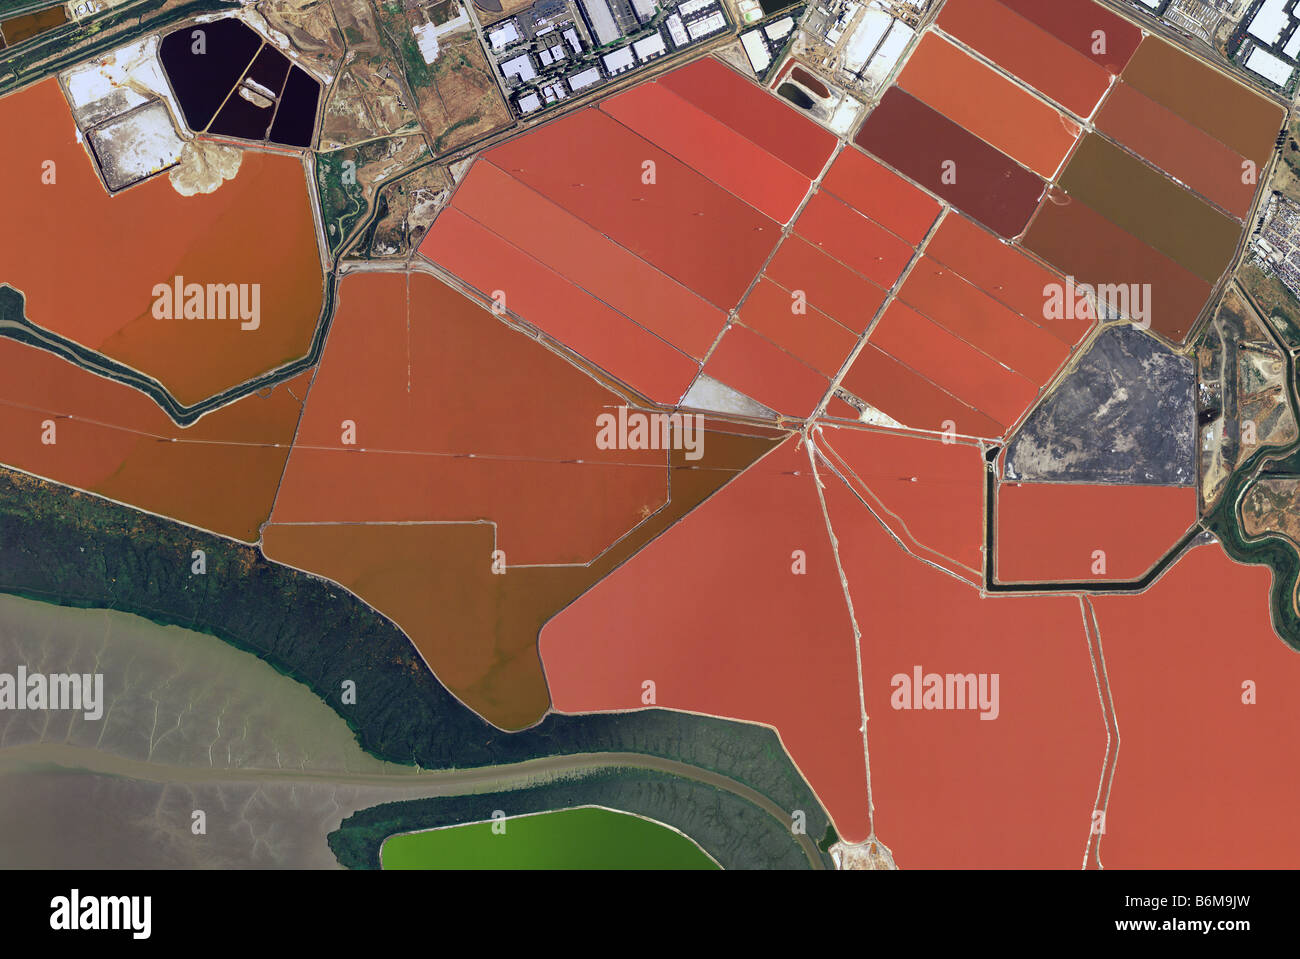 Aerial Map Of Cargill Newark California Salt Ponds San Francisco Bay